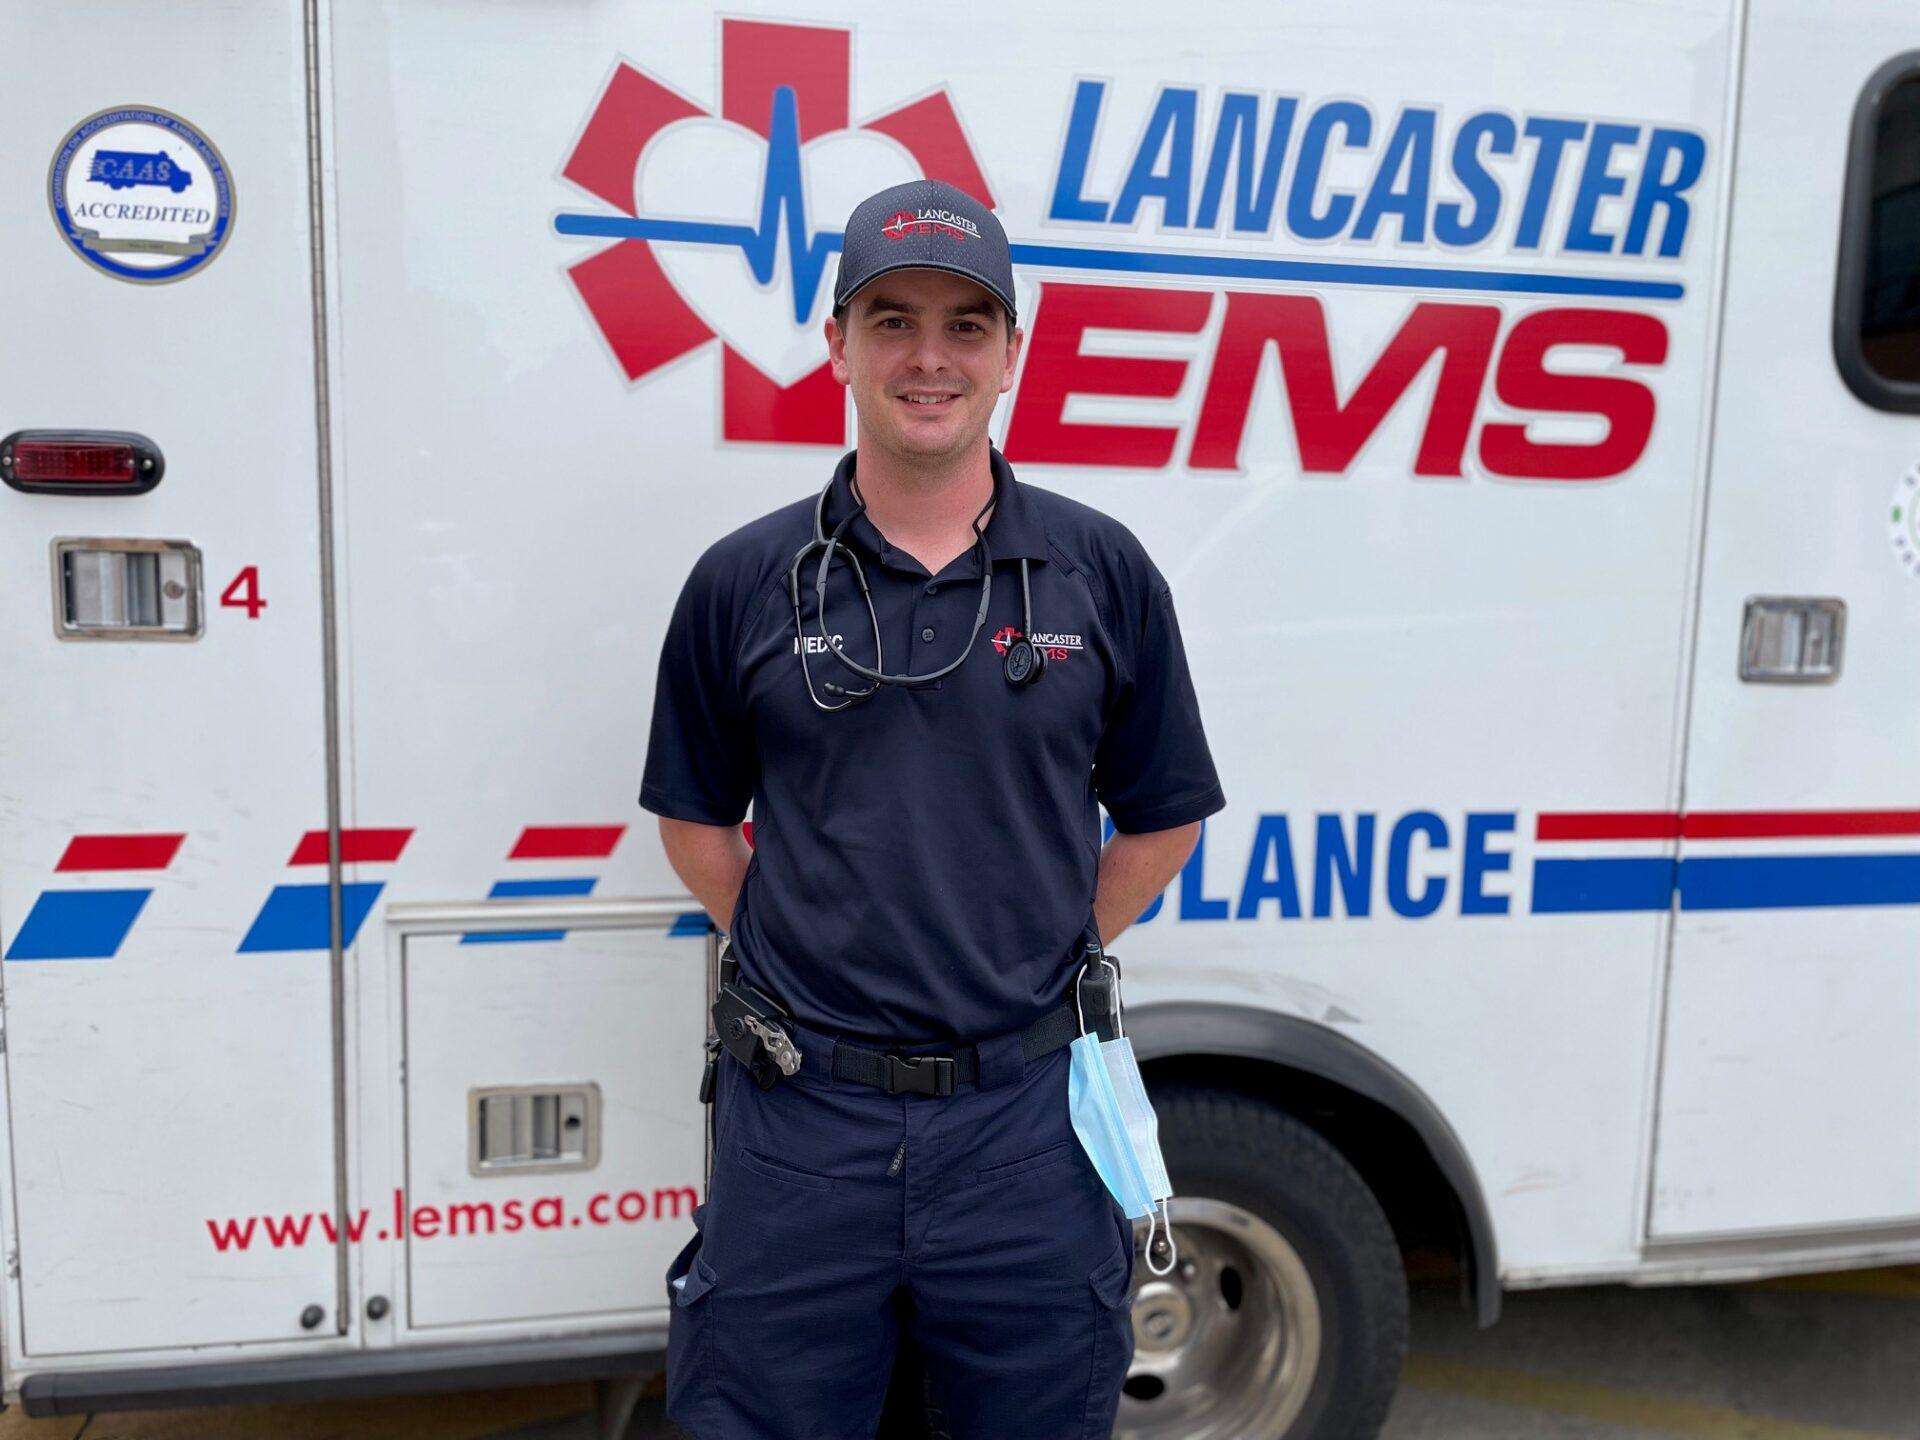 Lancaster EMS Paramedic John McCafferty. (Photo: Kyle Gamble)